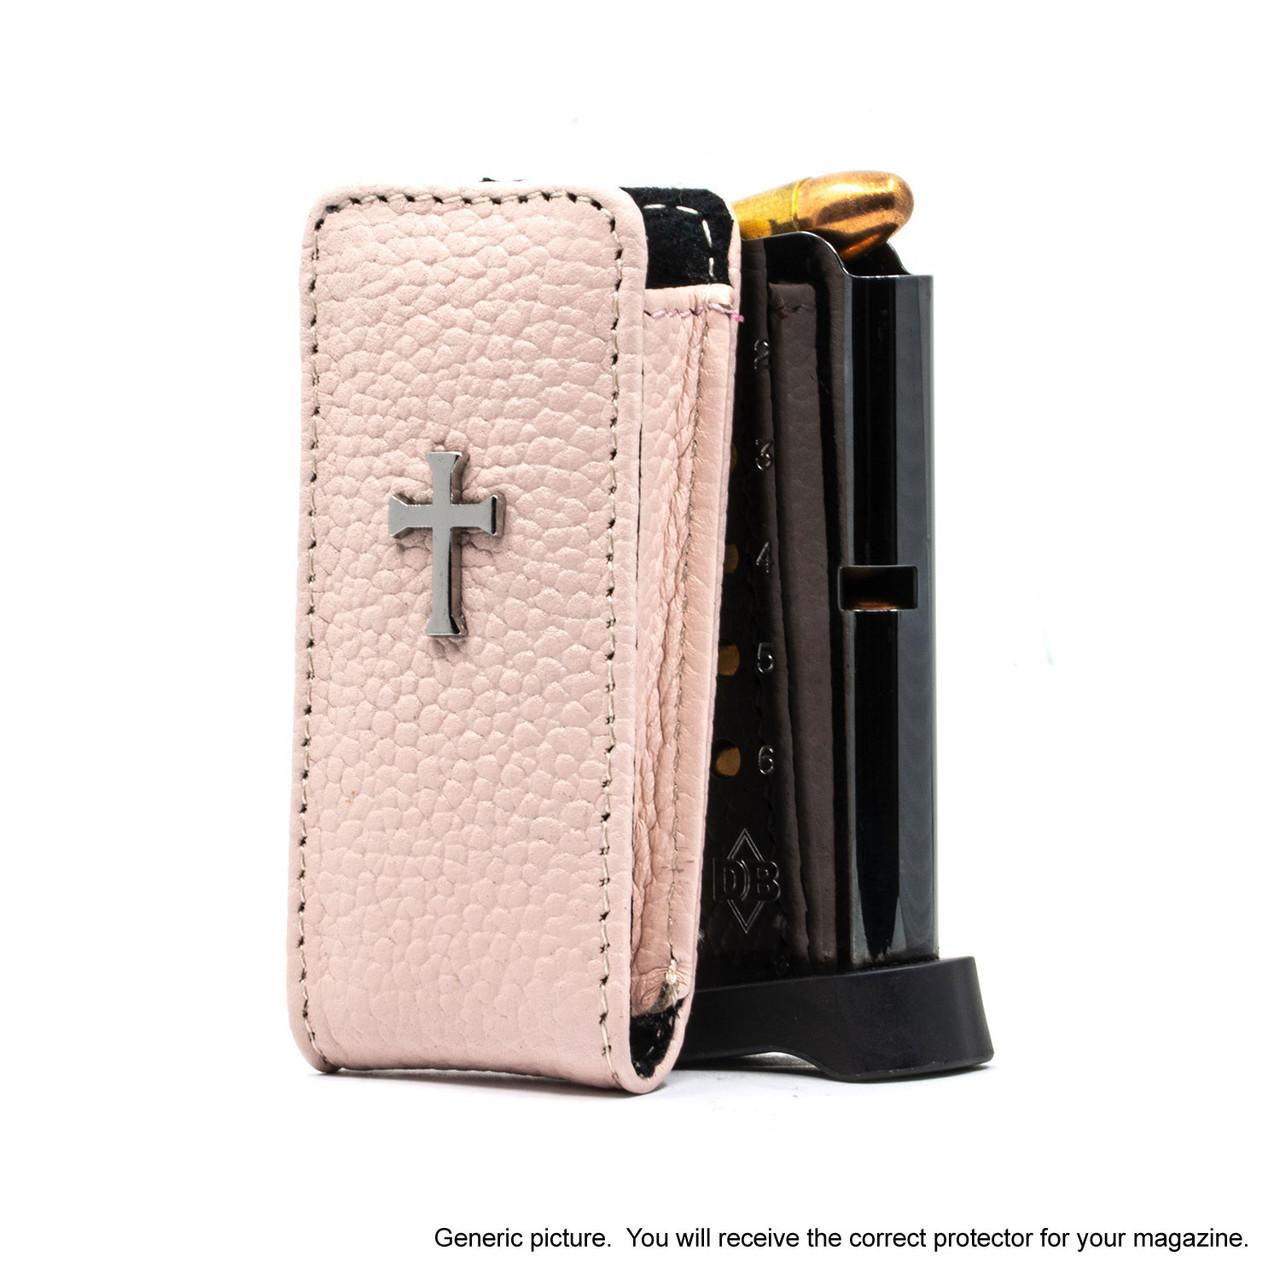 Colt MusBlackg Pocketlite Pink Carry Faithfully Cross Magazine Pocket Protector